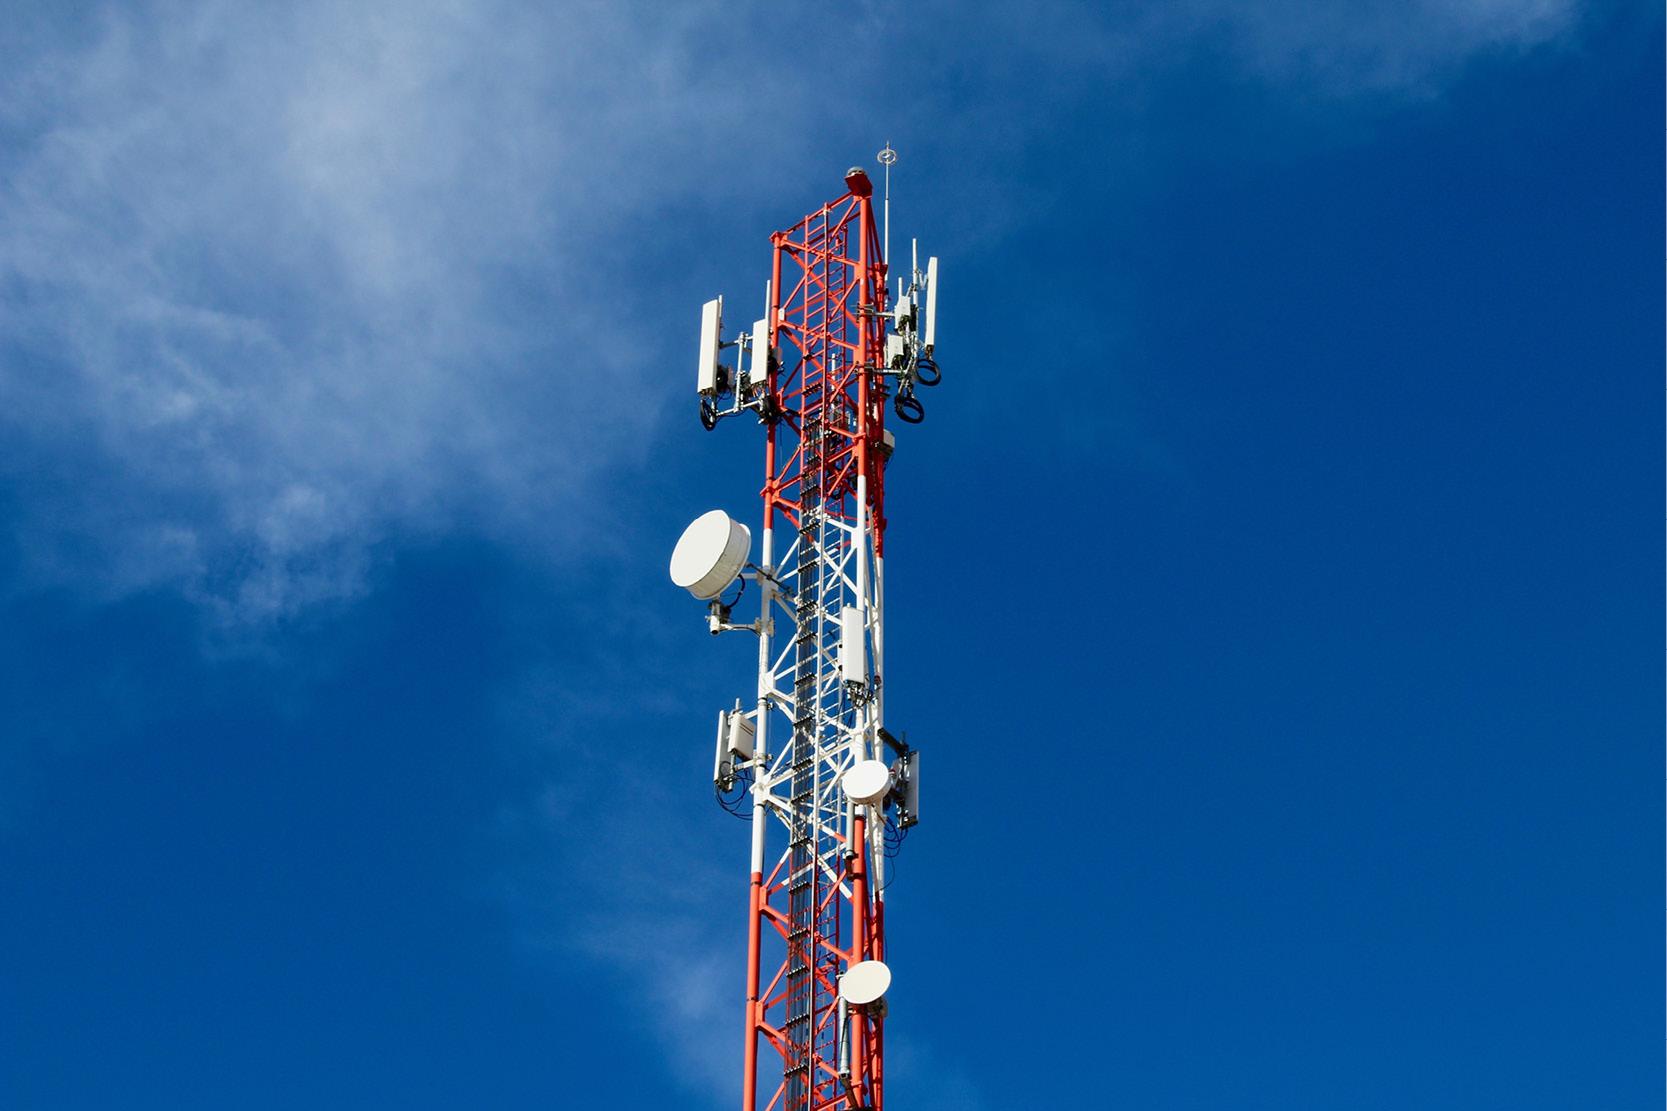 Solar Obstruction Lighting for Communication Tower